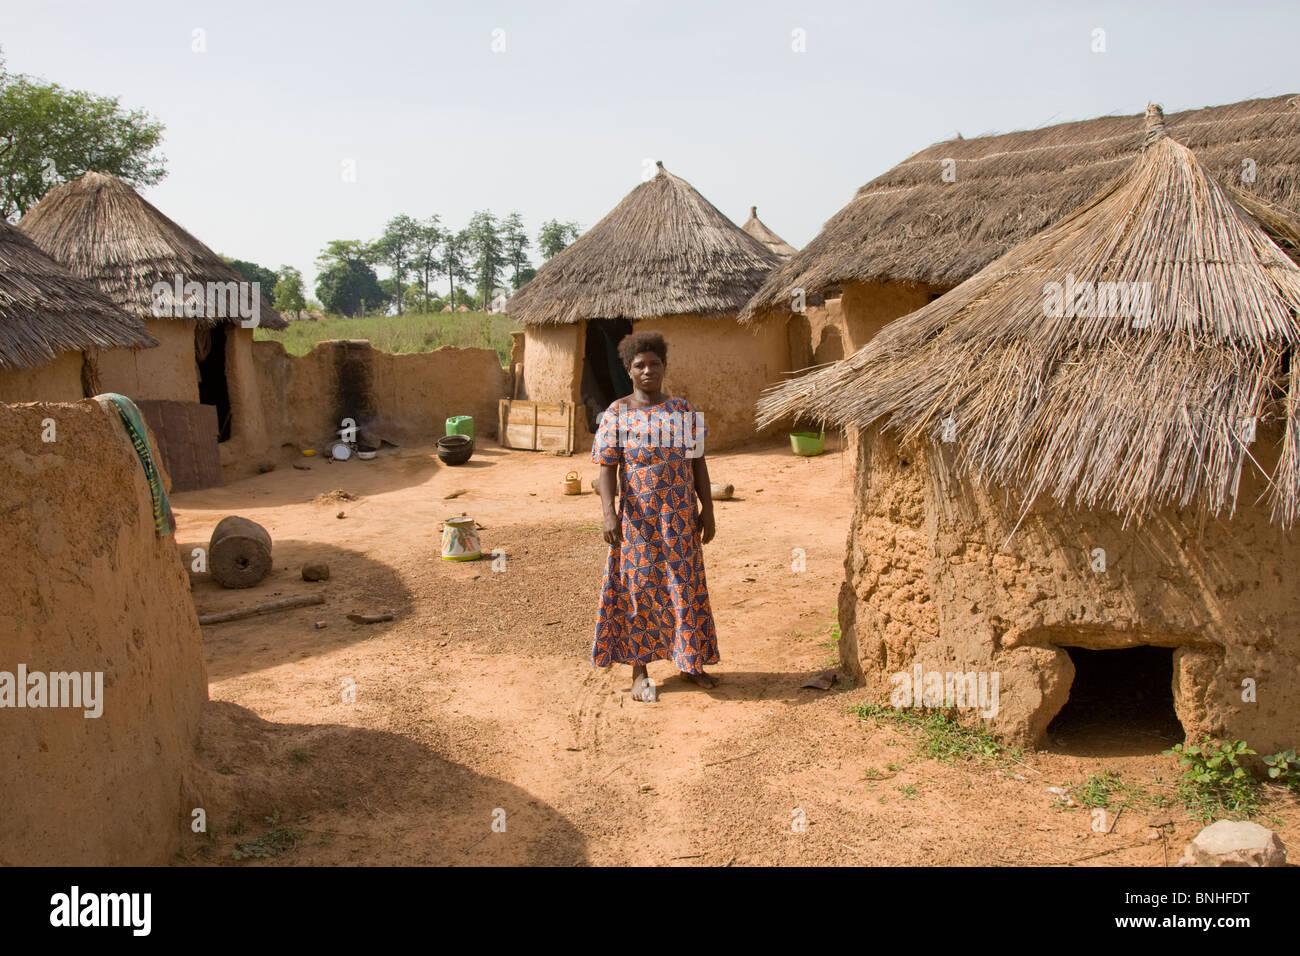 Mamprusi woman at the village of Sor No. 1, Gonja triangle, Damango district, Ghana. - Stock Image